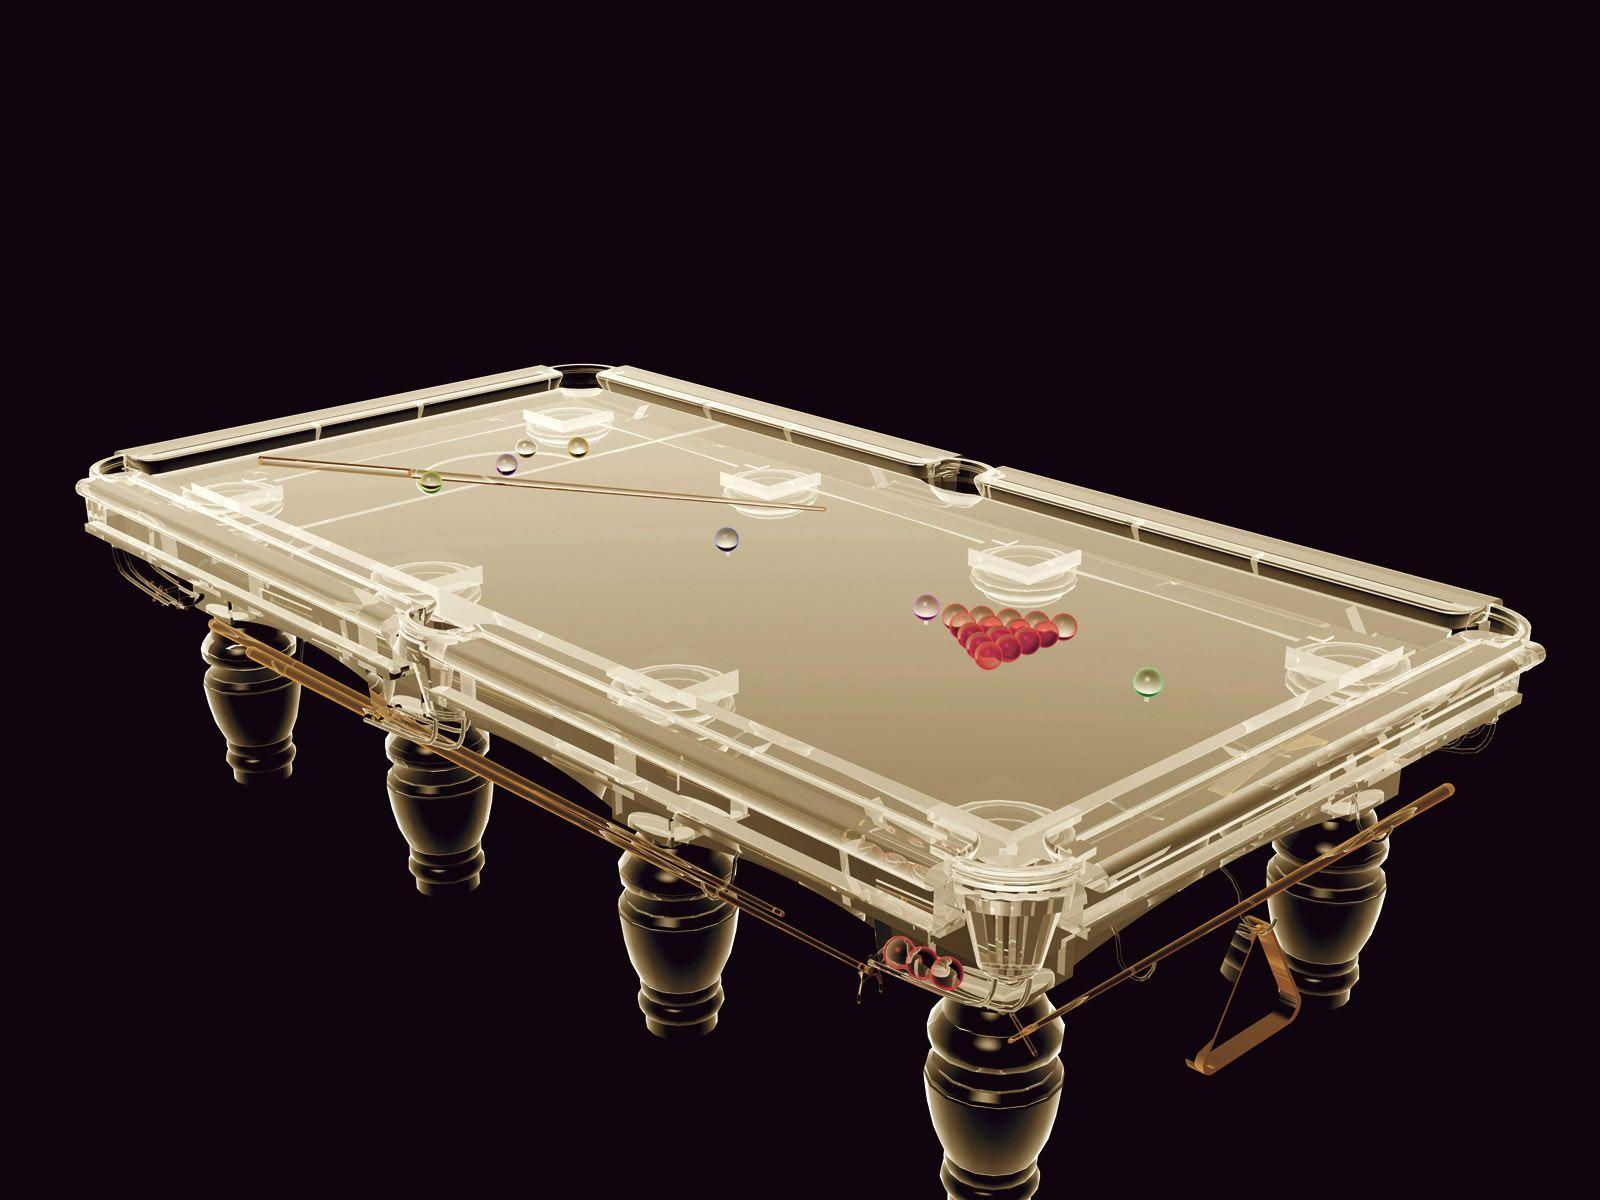 Neon Glass Pool Table Httpwwwzastavkicom Billiards - Neon pool table